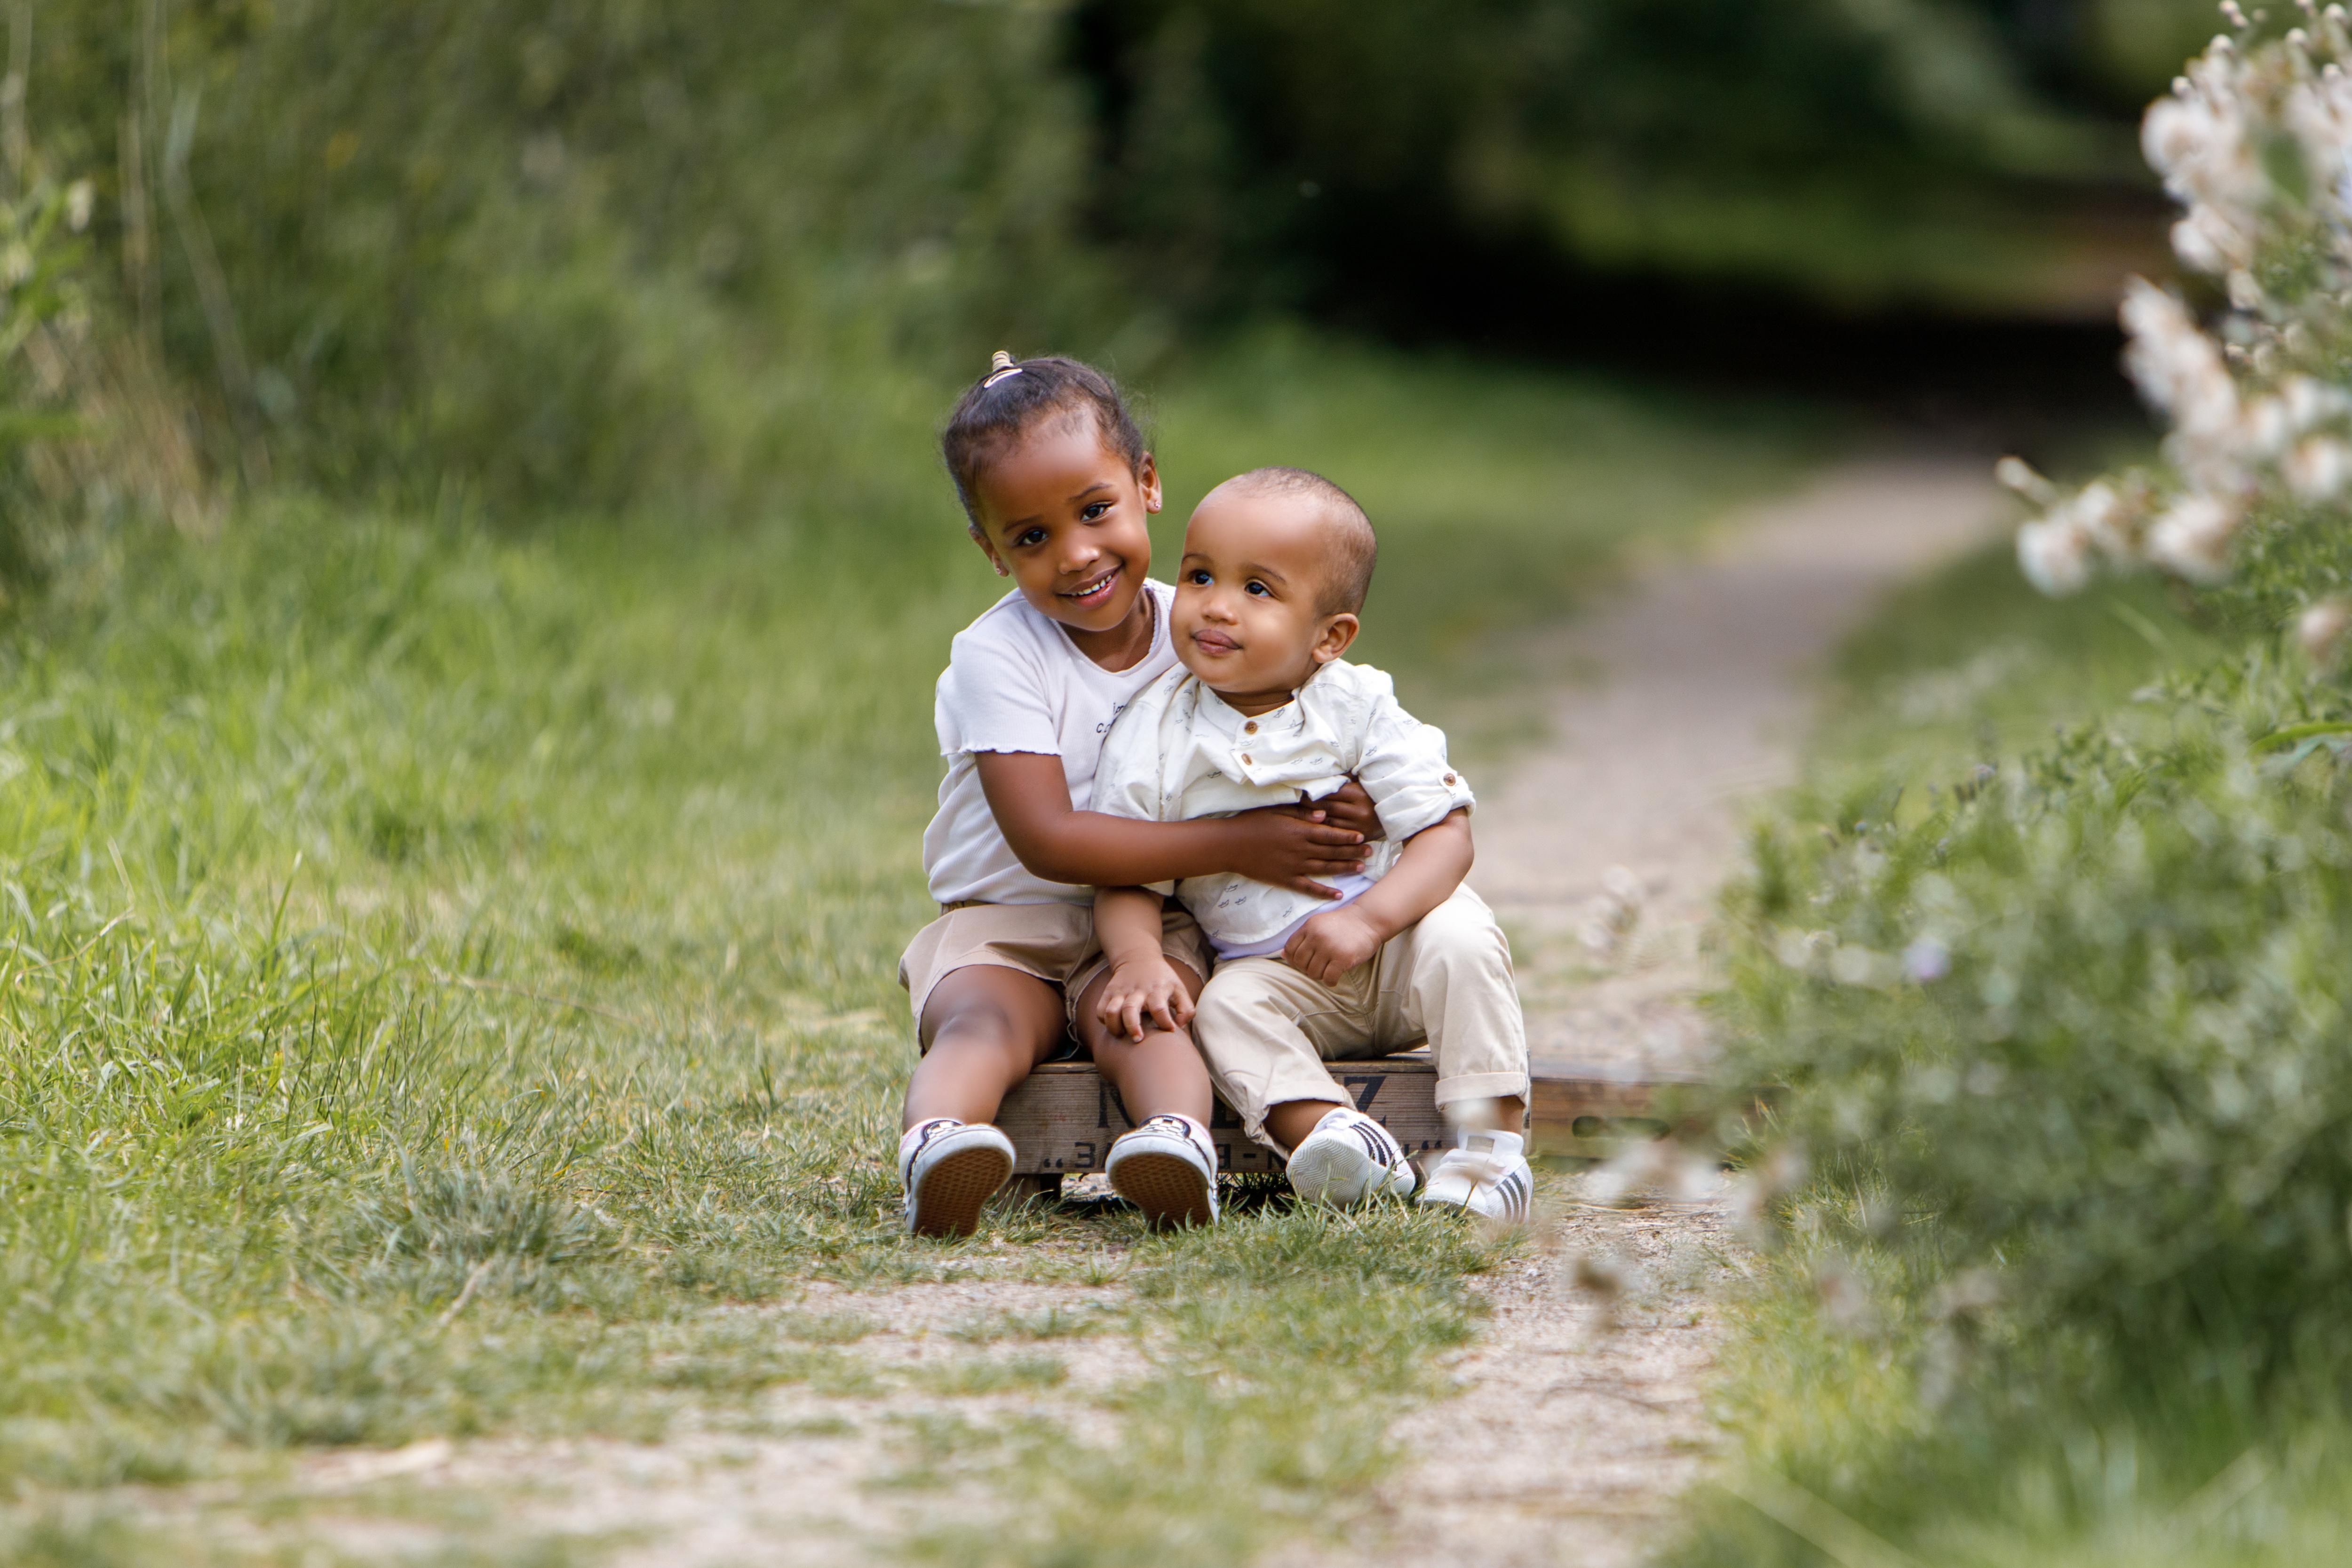 gezins fotoshoot in het bos